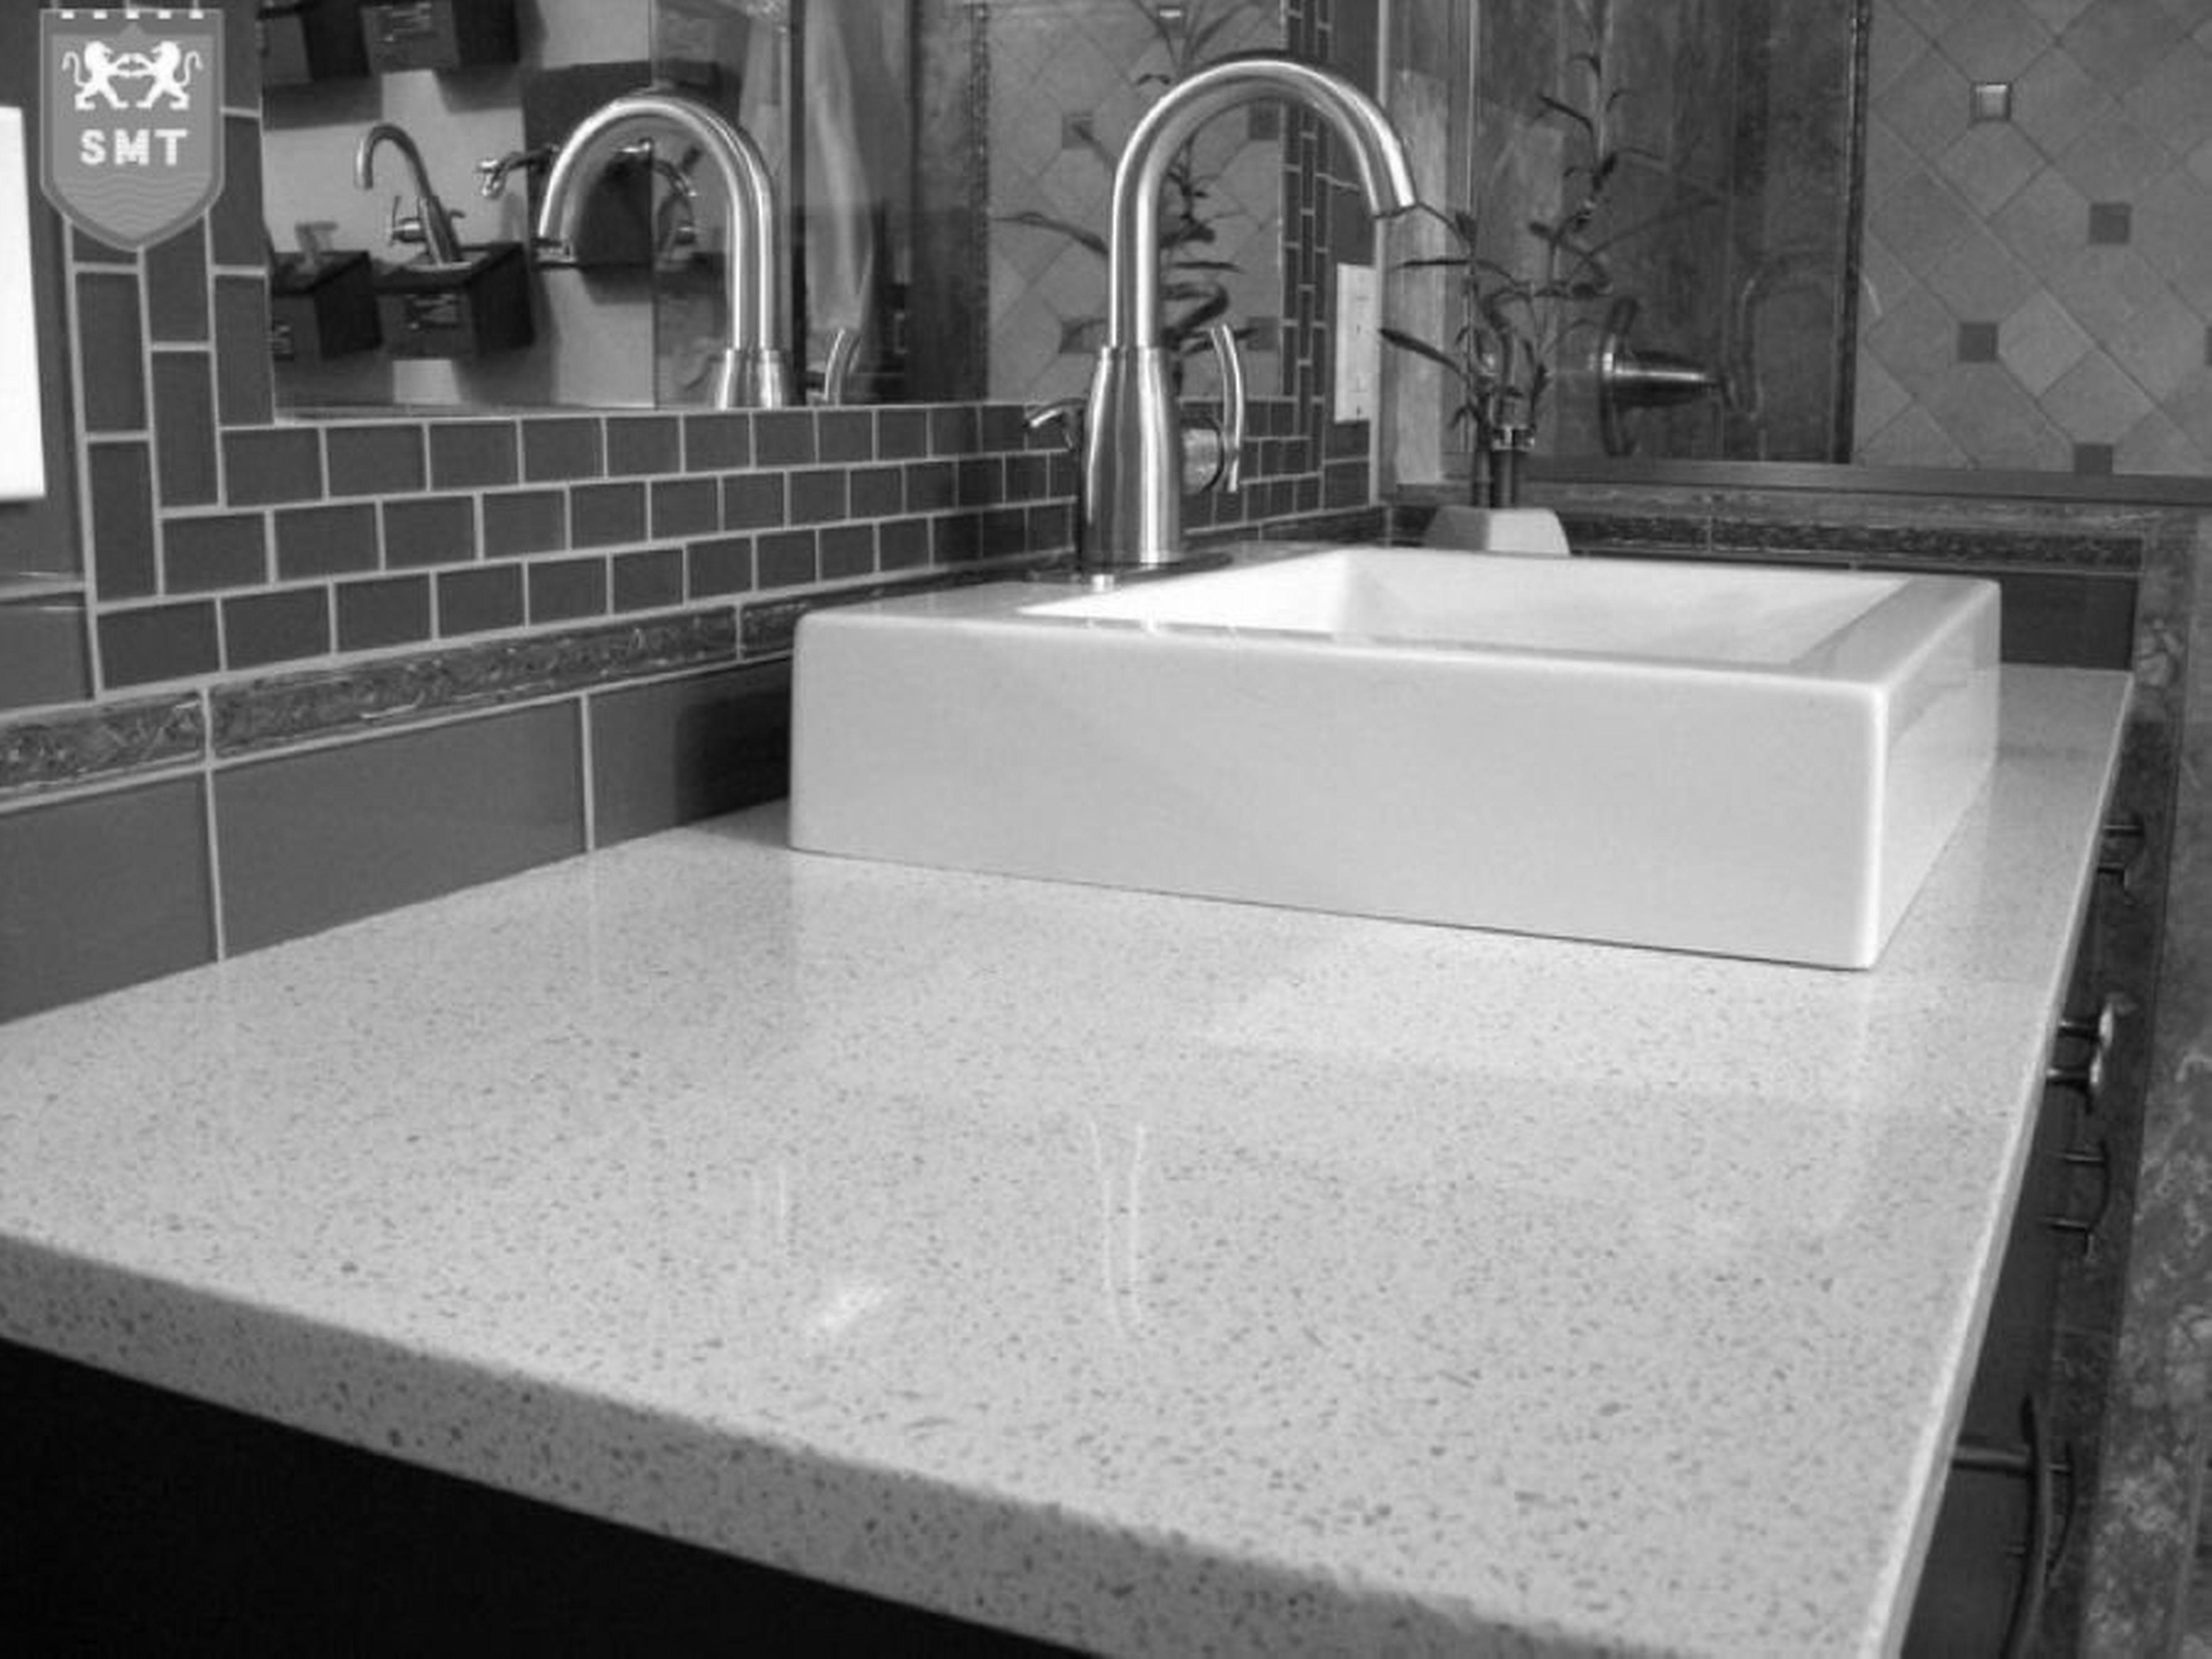 Decor Tips Great White Granite Countertops And Rectangular Sink